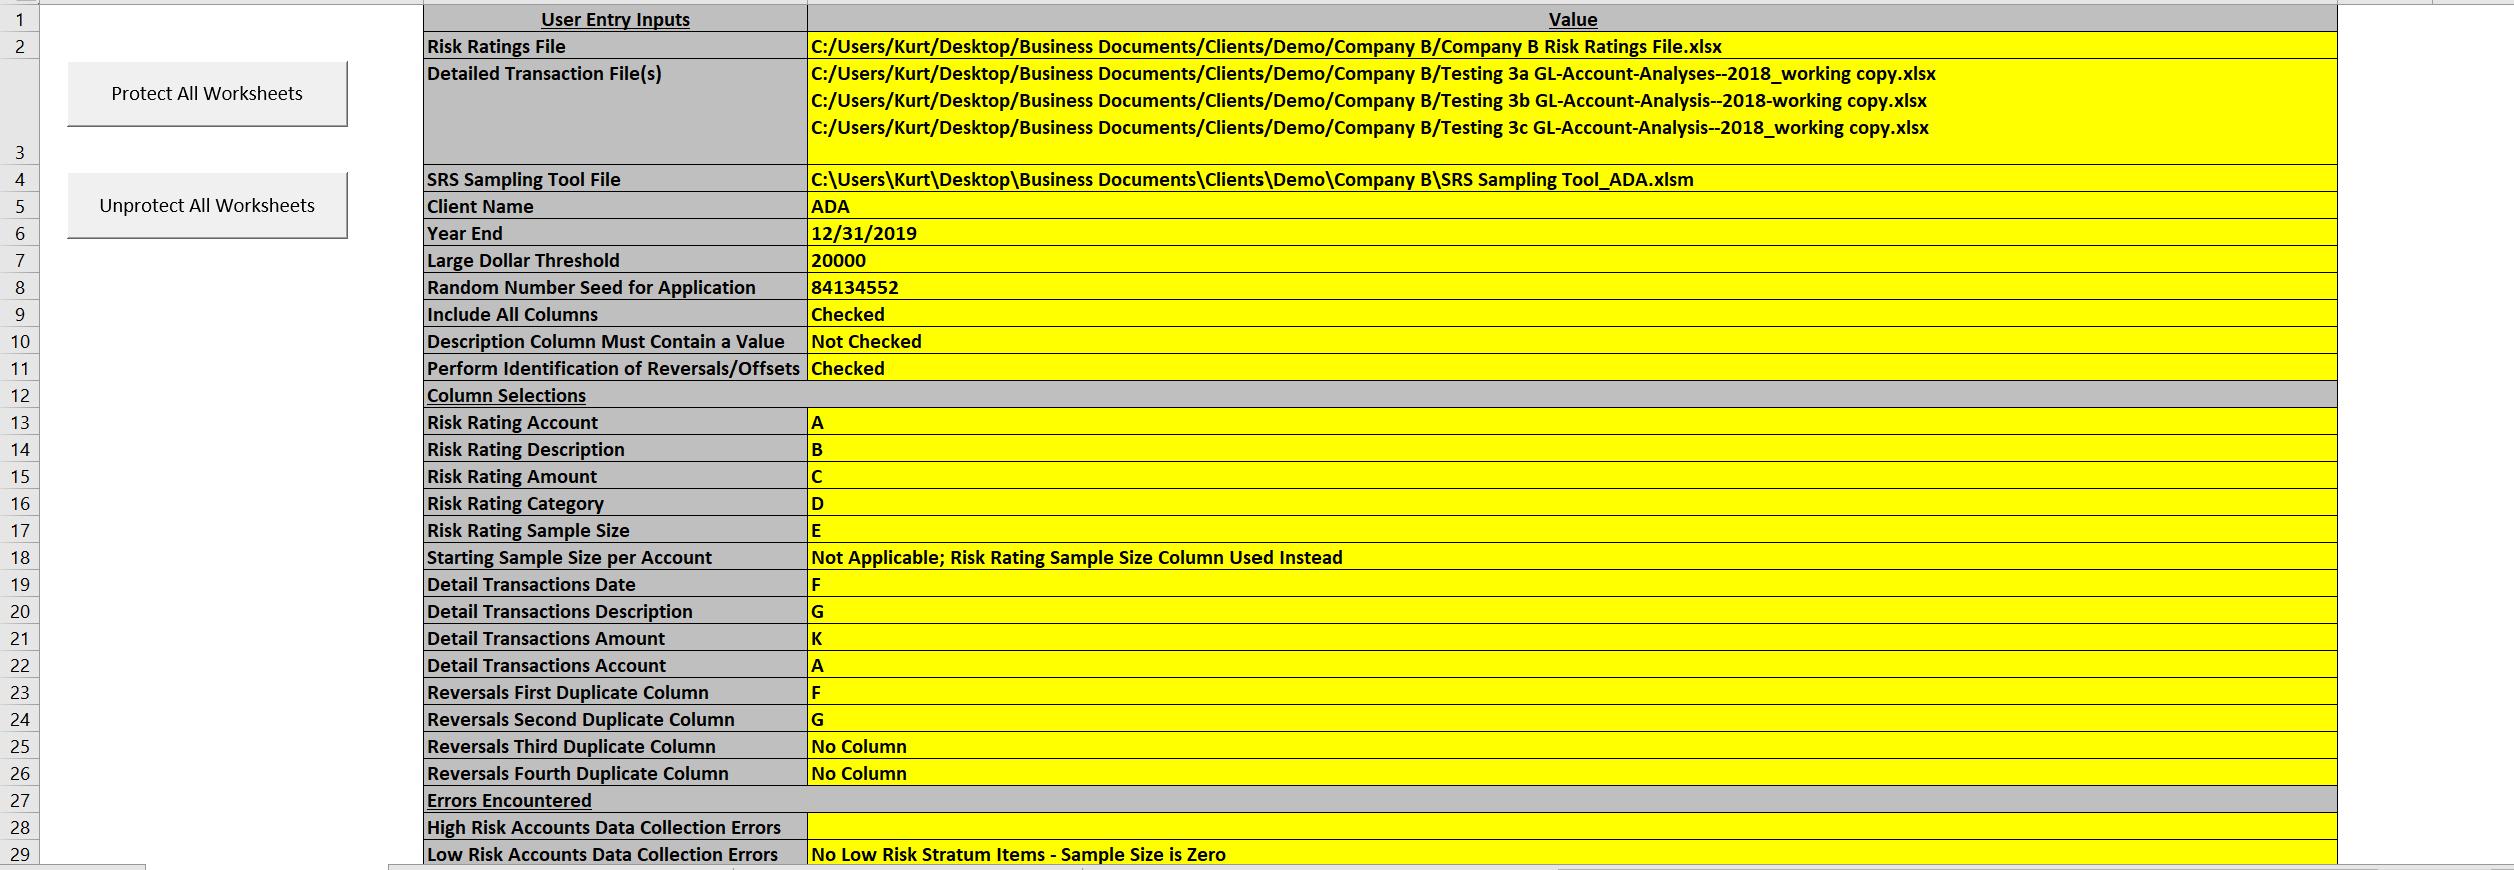 Sampling Tool Inputs and Errors